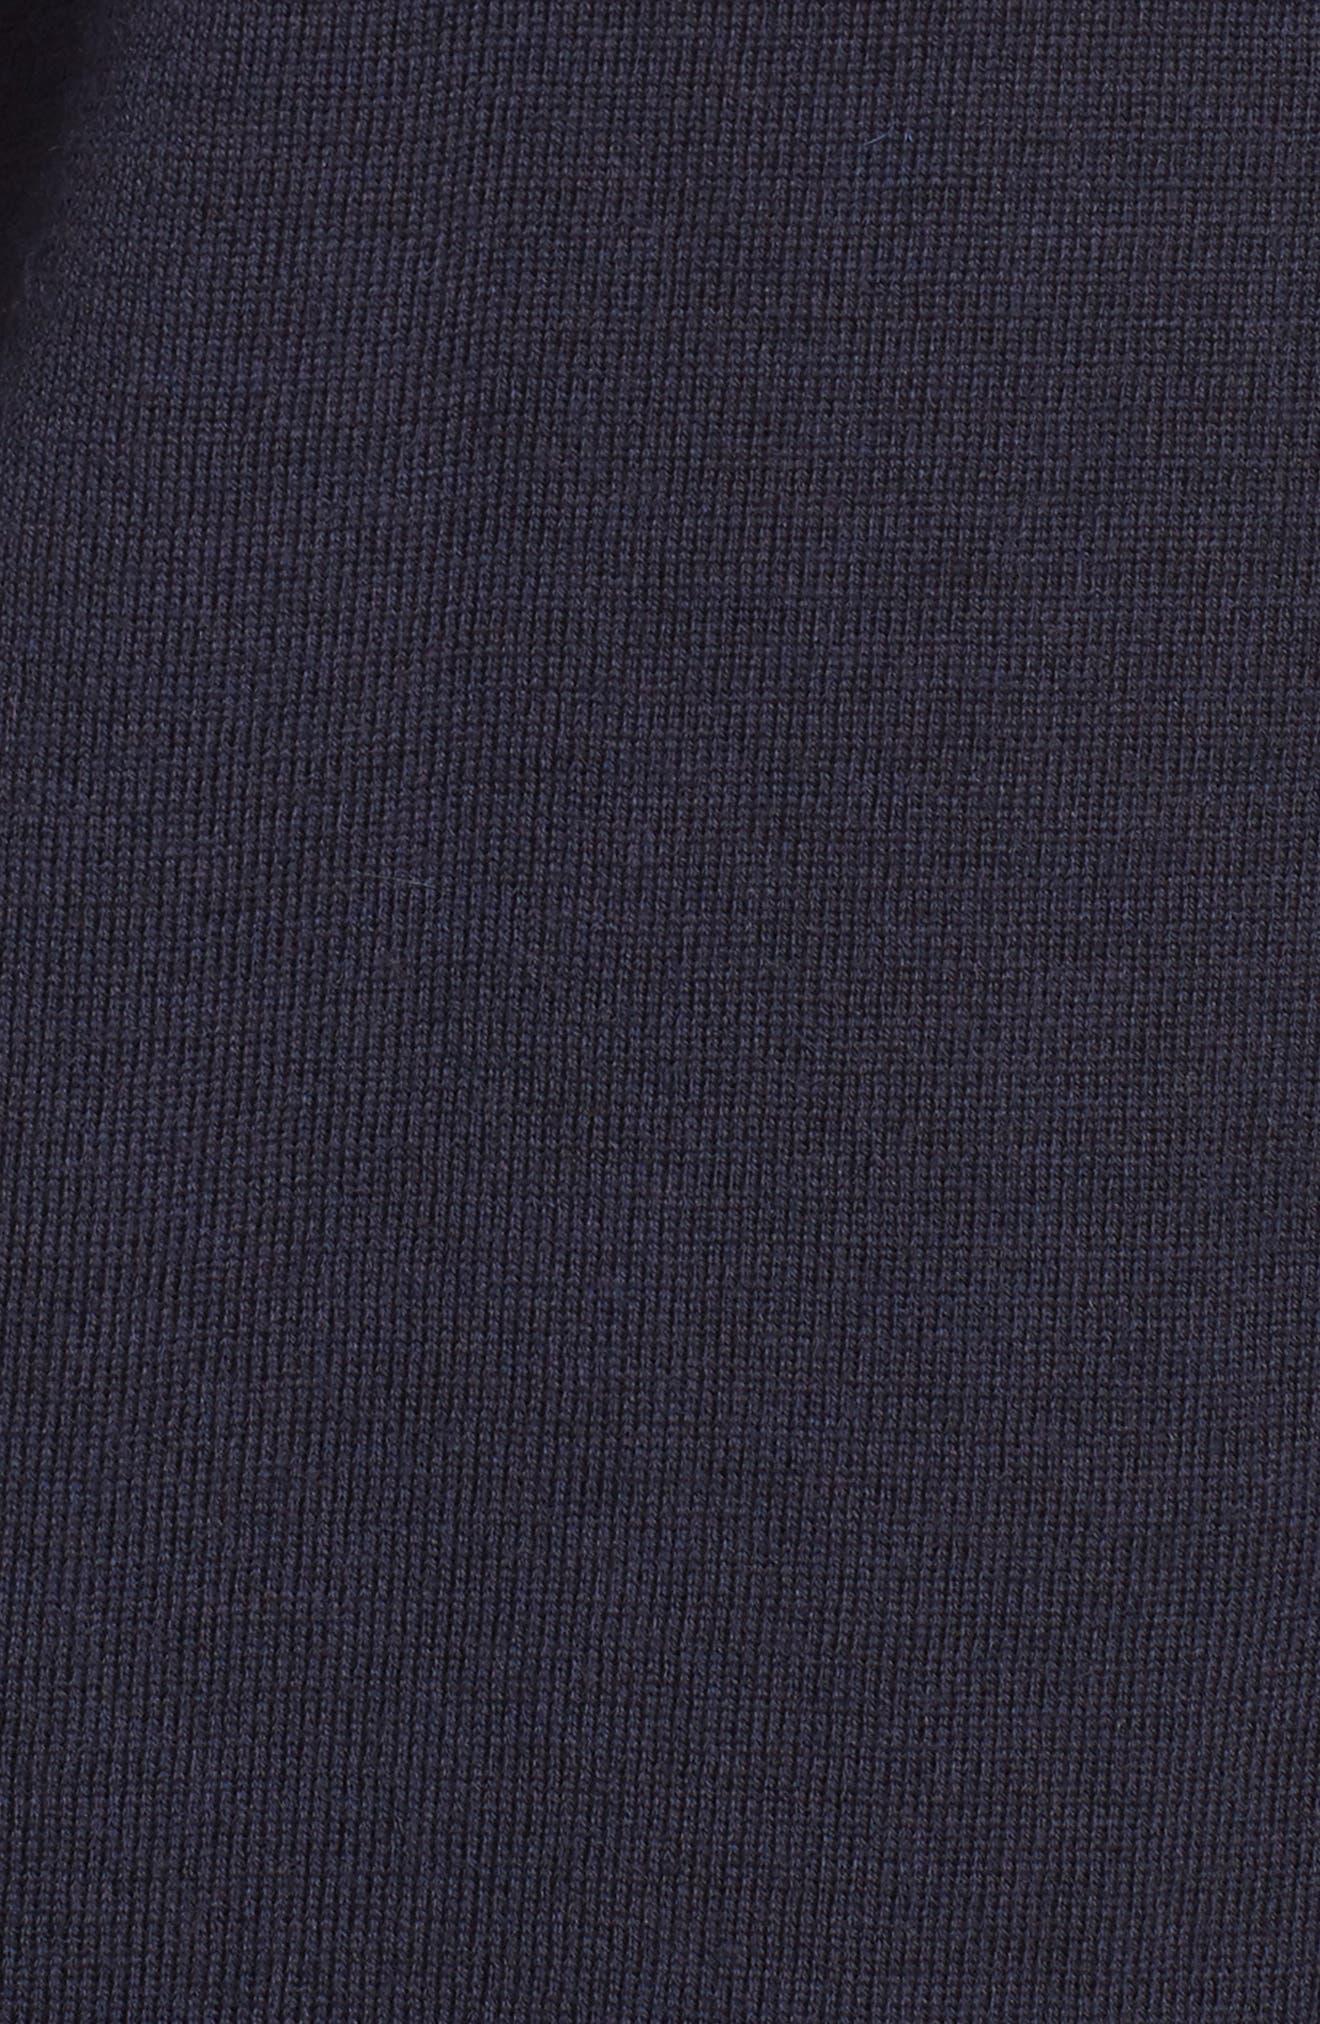 Merino Wool Boxy Turtleneck Sweater,                             Alternate thumbnail 27, color,